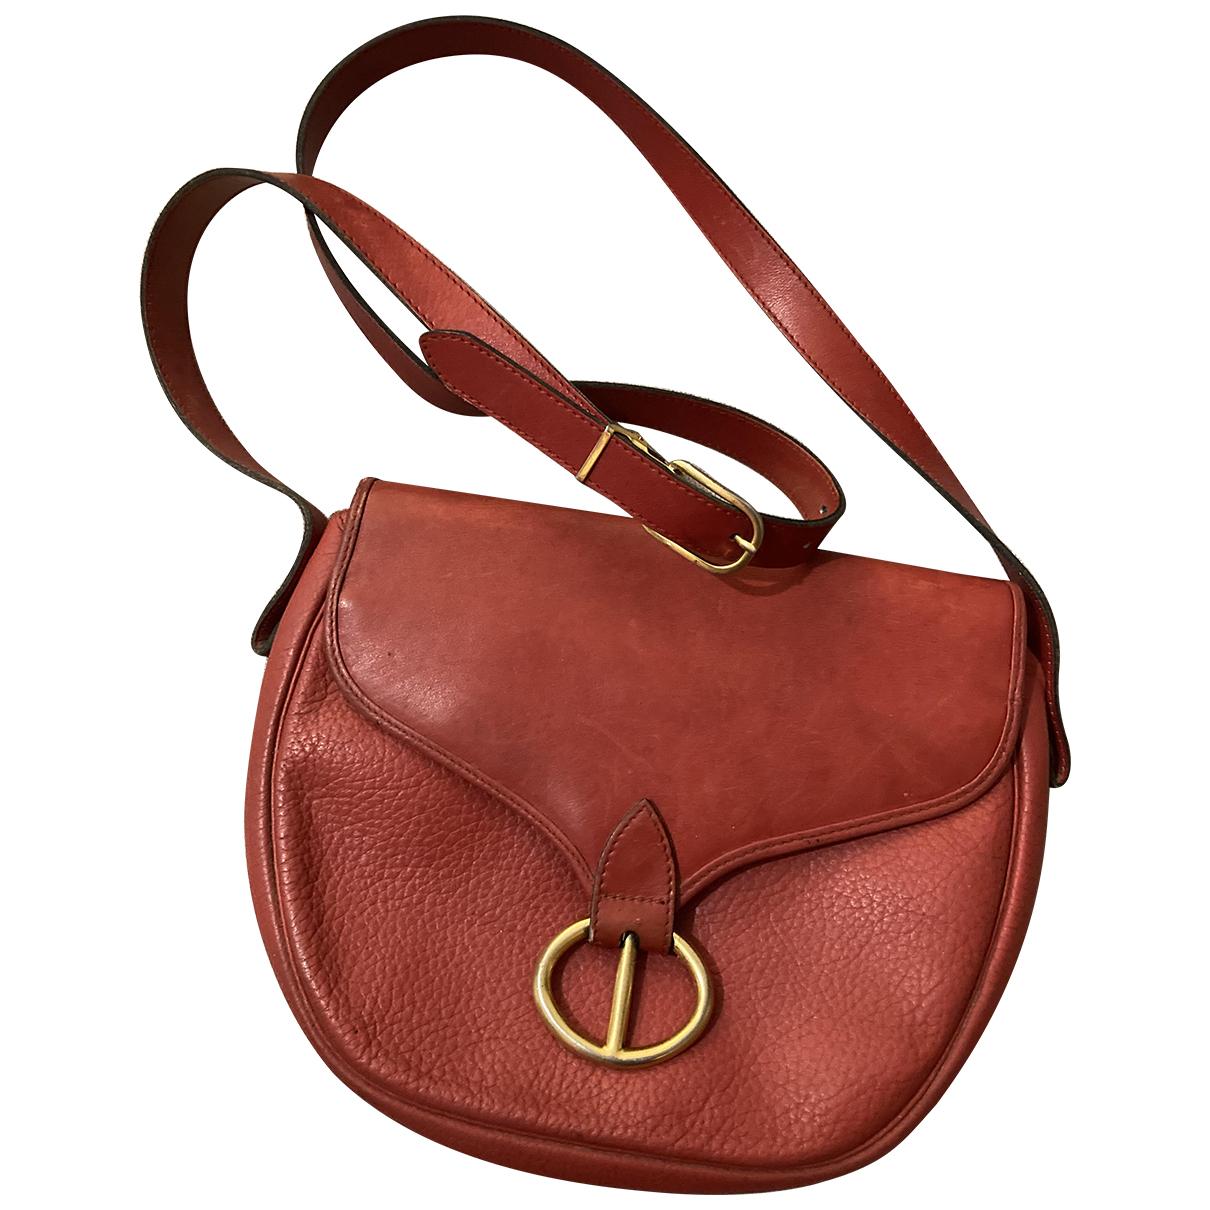 Dior N Red Leather handbag for Women N